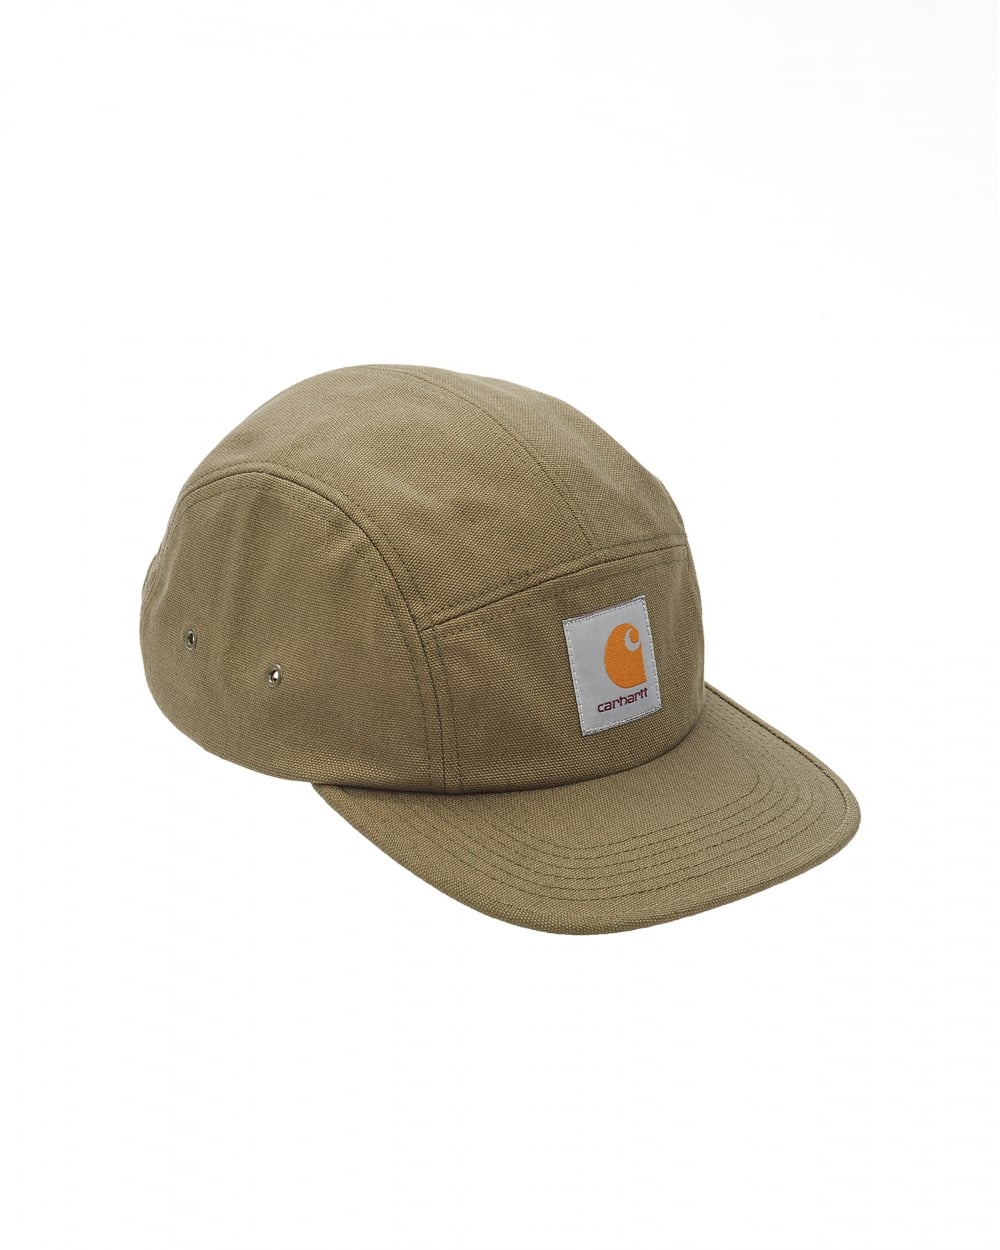 carhartt mens hat olive green logo baseball cap